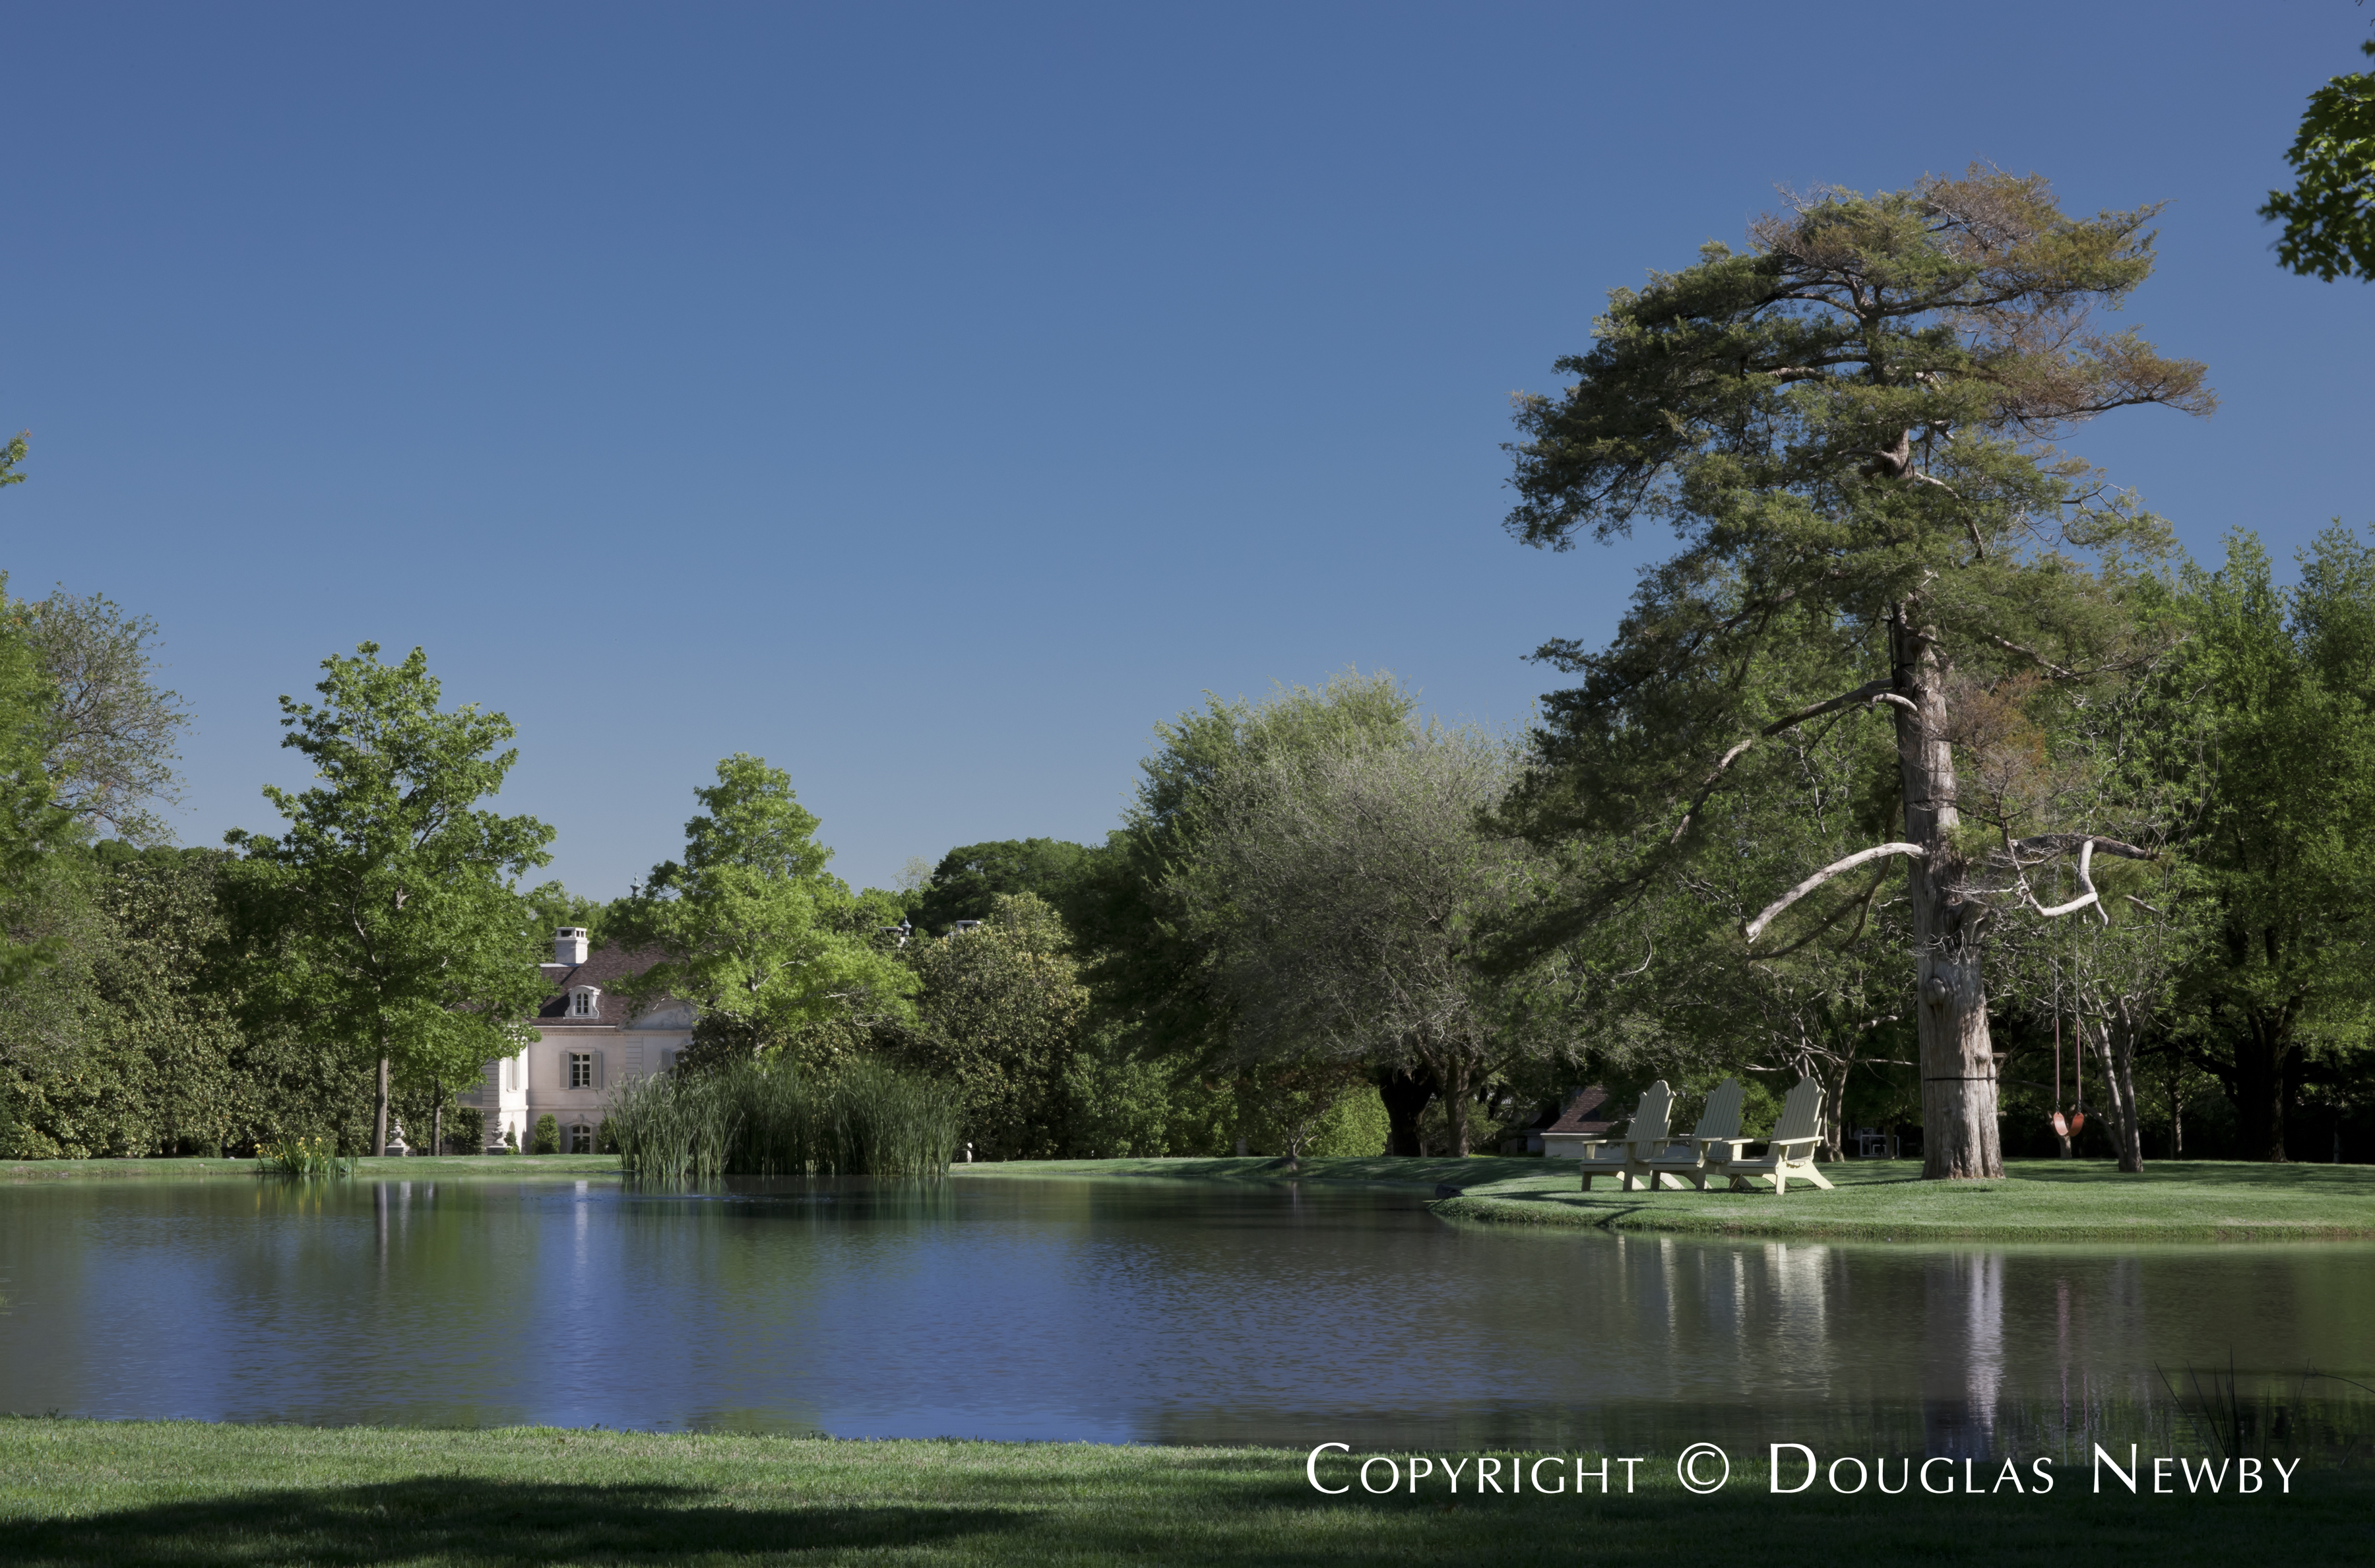 Peaceful Pond on the Crespi Hicks Estate Property